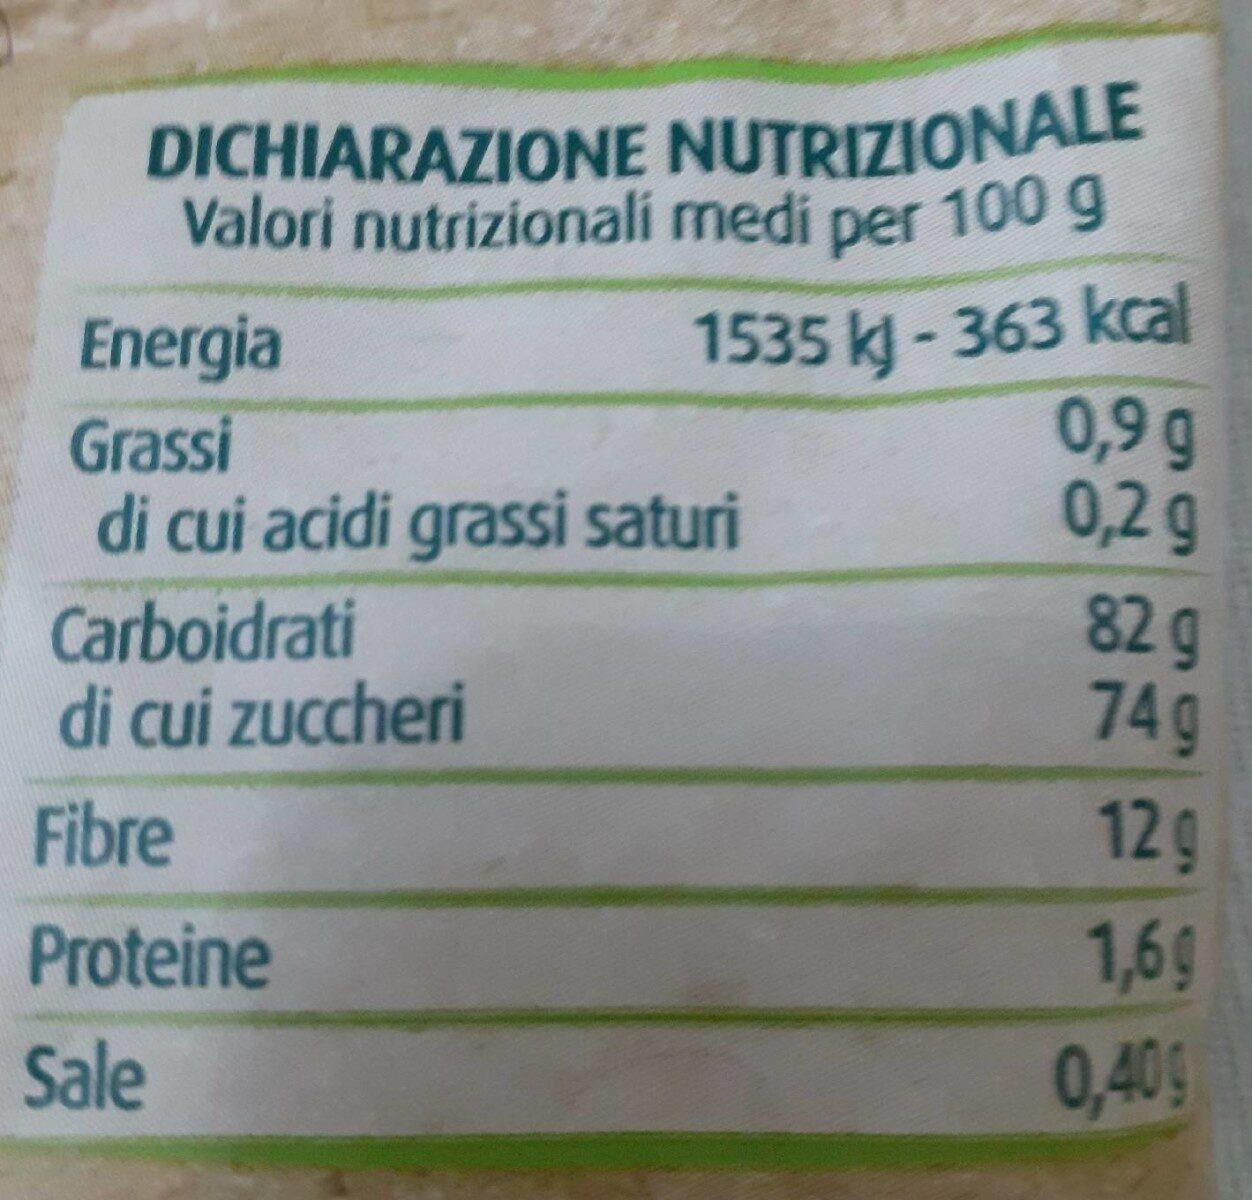 Spicchi di mela senza buccia disidratati - Informazioni nutrizionali - fr